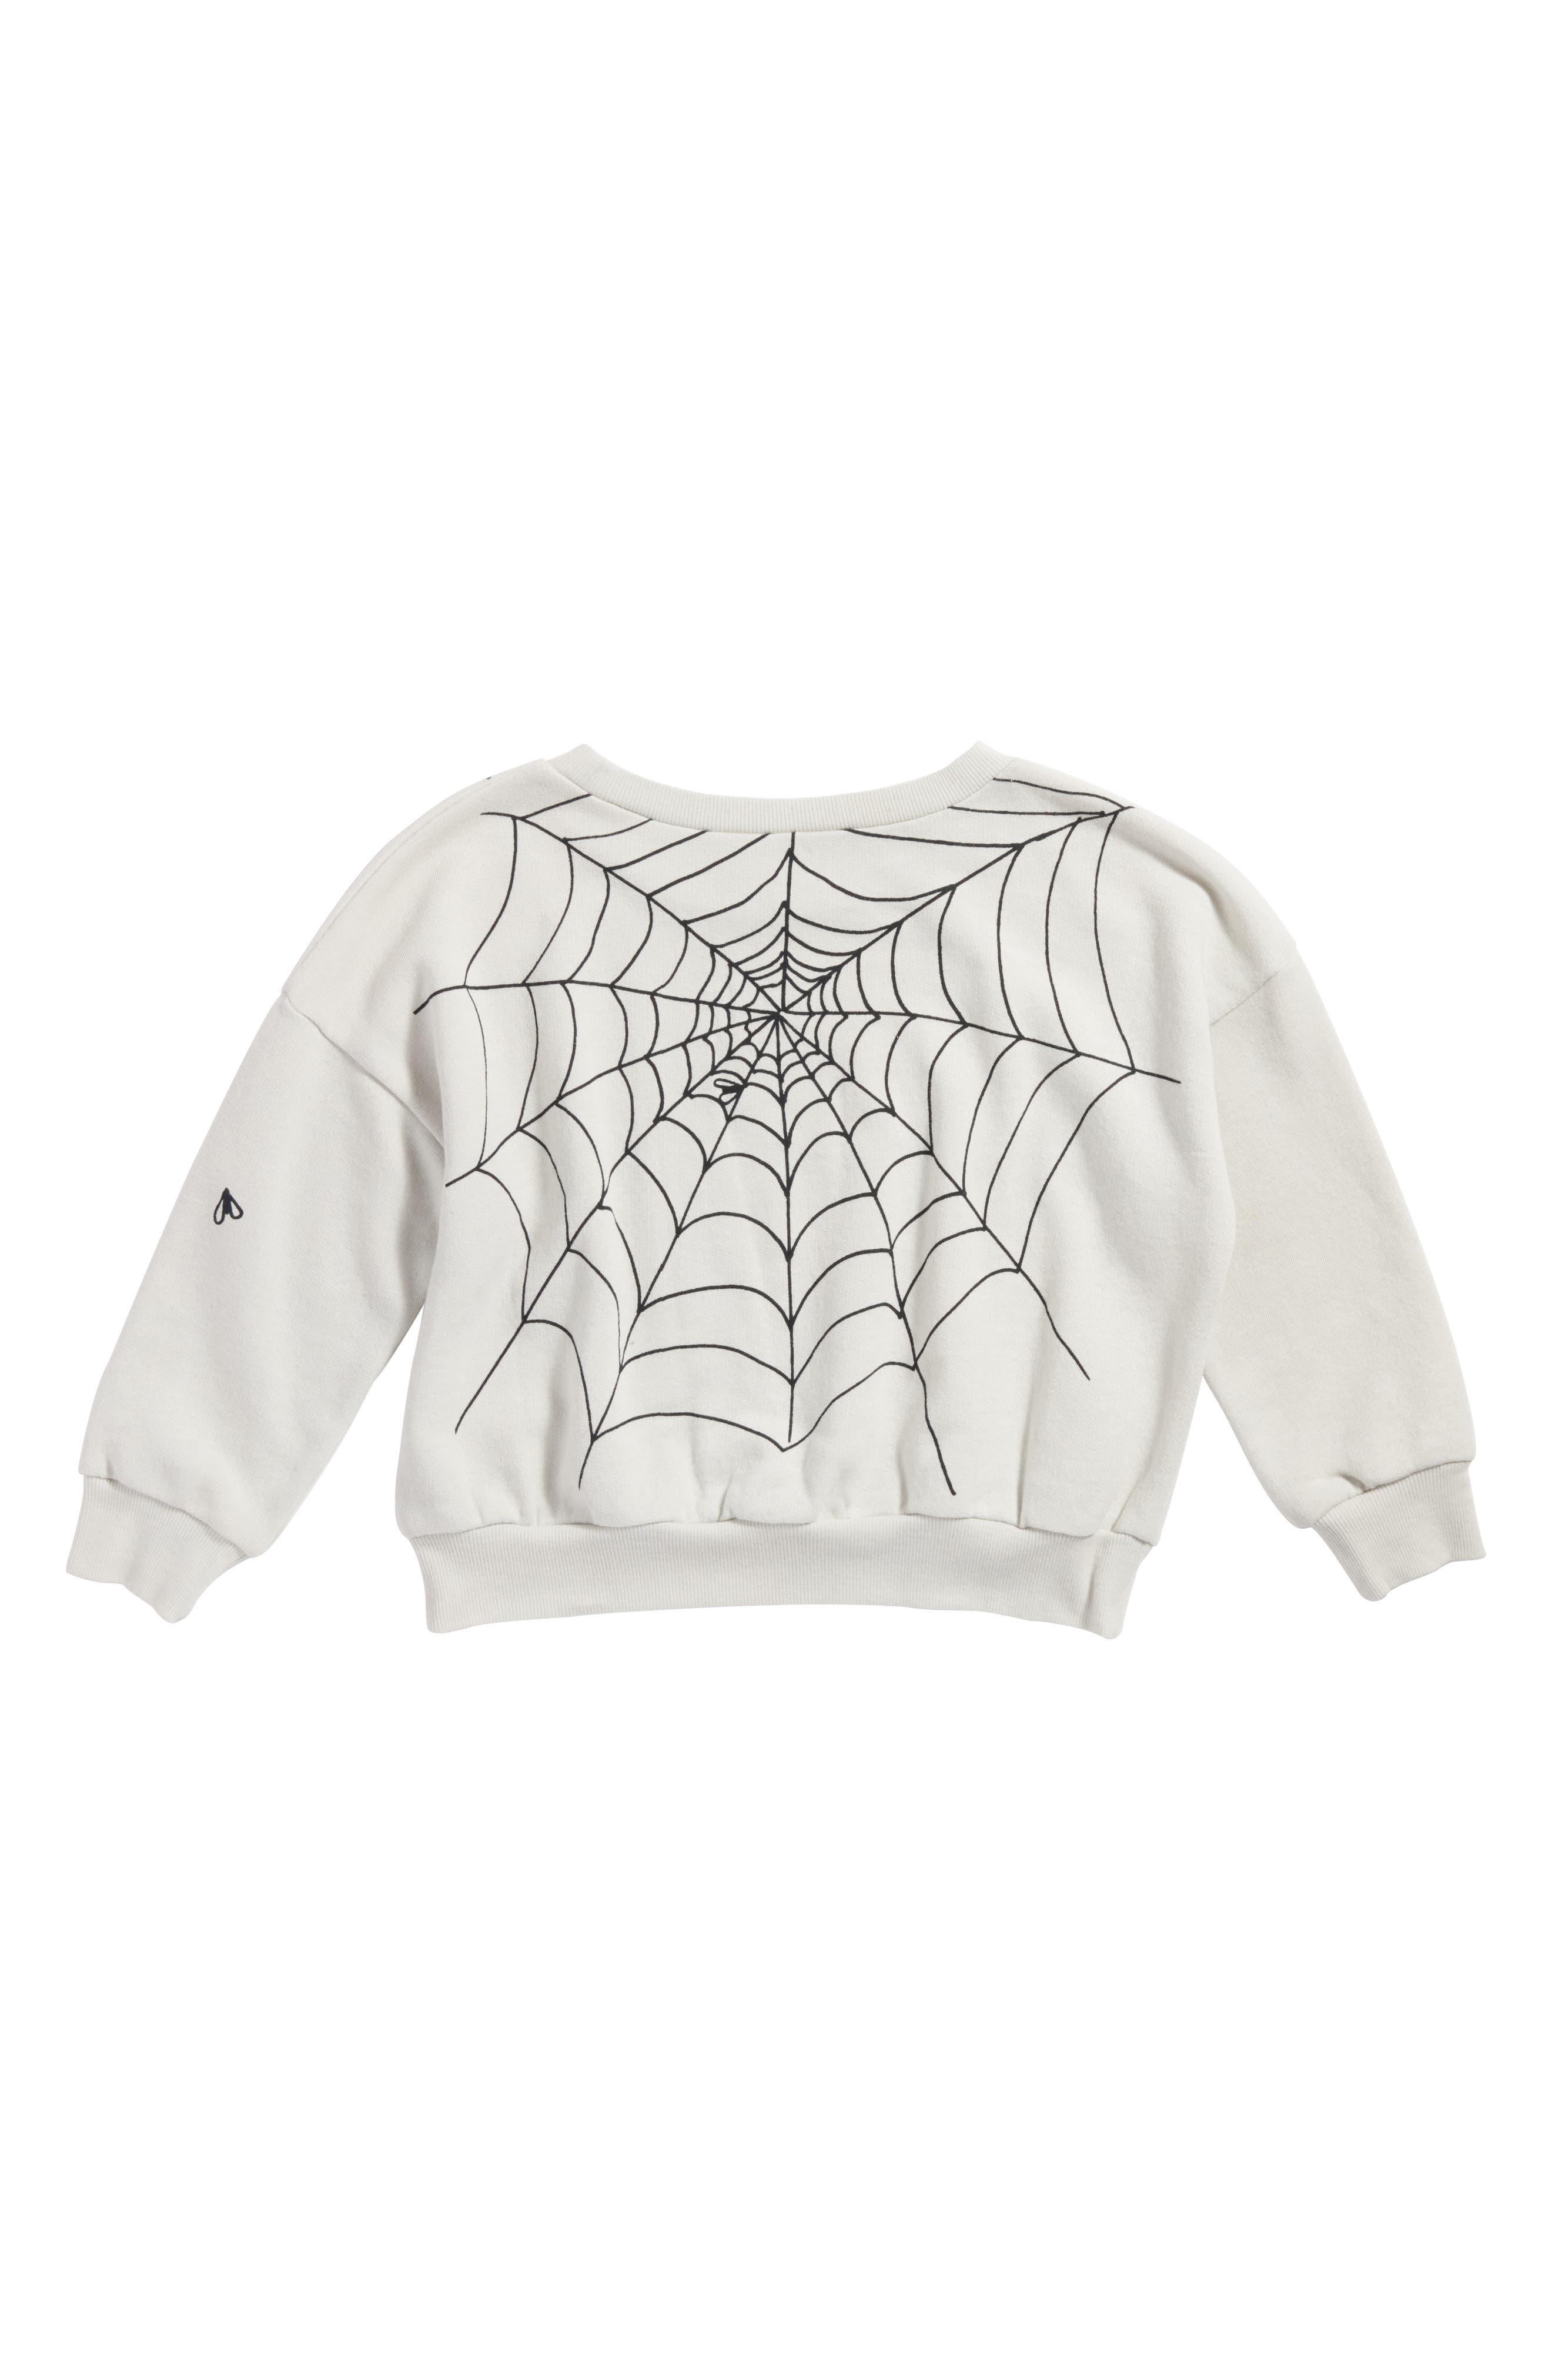 Graphic Sweatshirt,                             Alternate thumbnail 3, color,                             Grey Lunar Spider